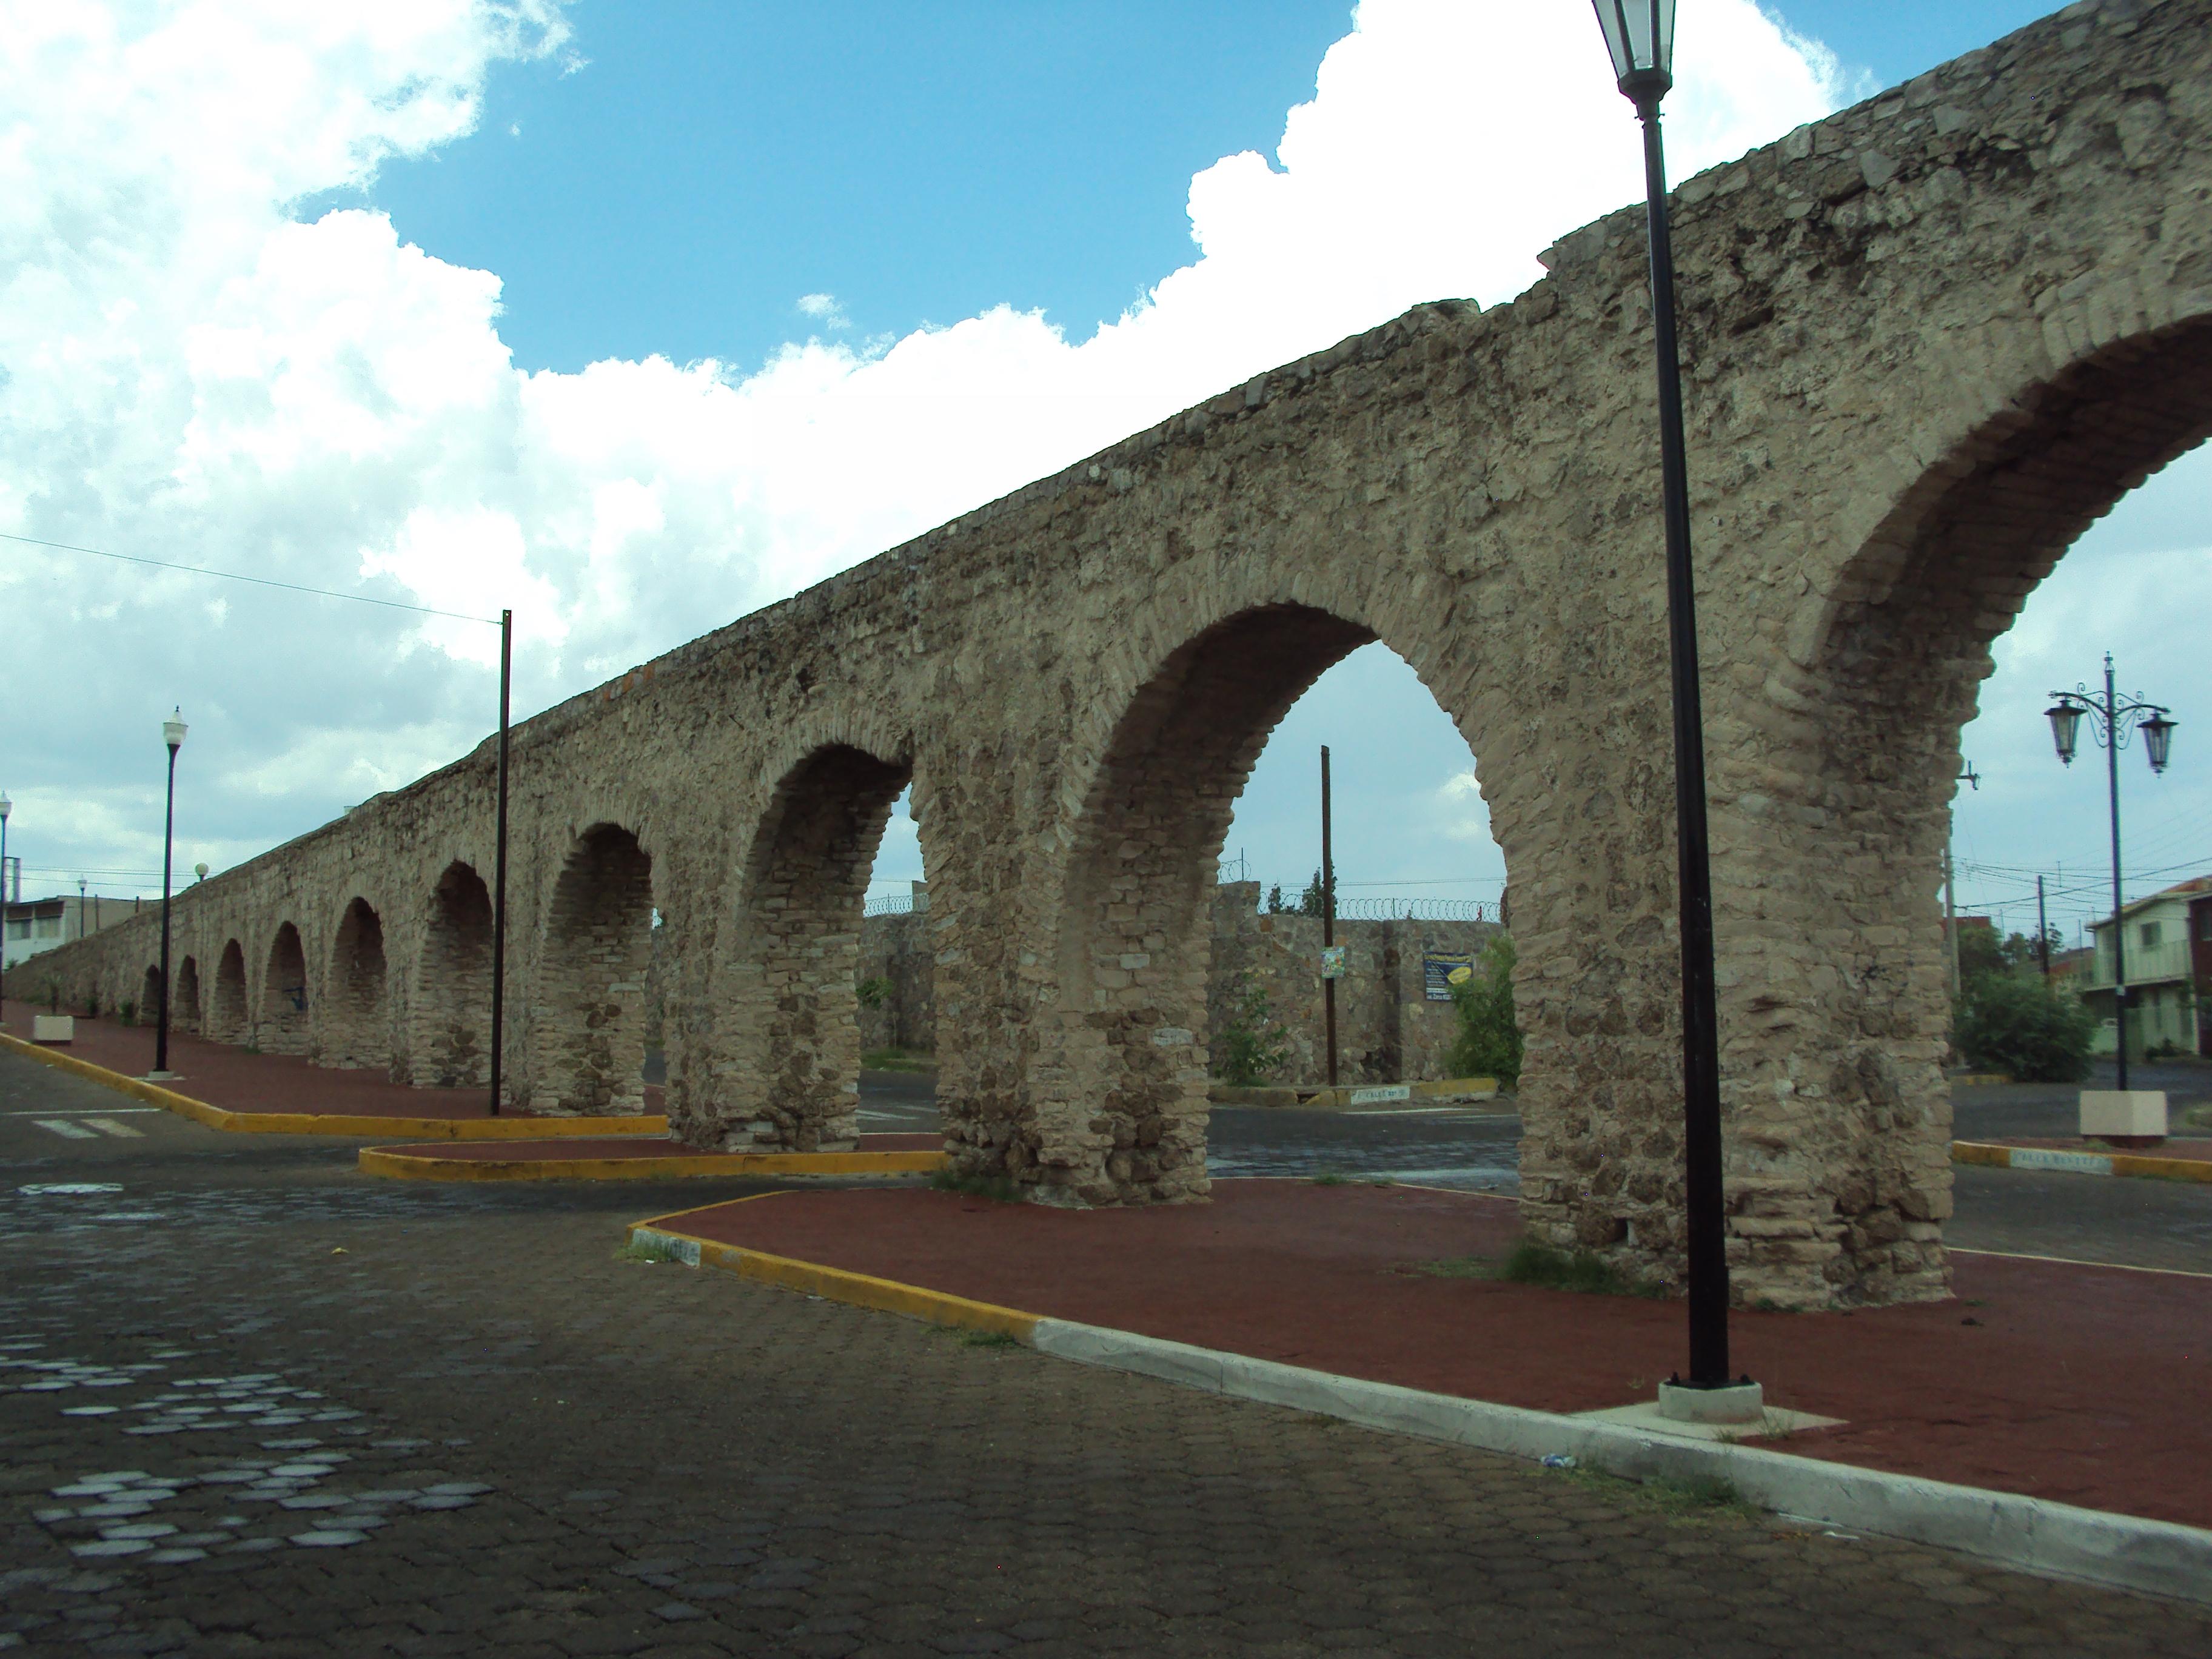 Acueducto de chihuahua wikiwand for Fabrica de sillones zona sur